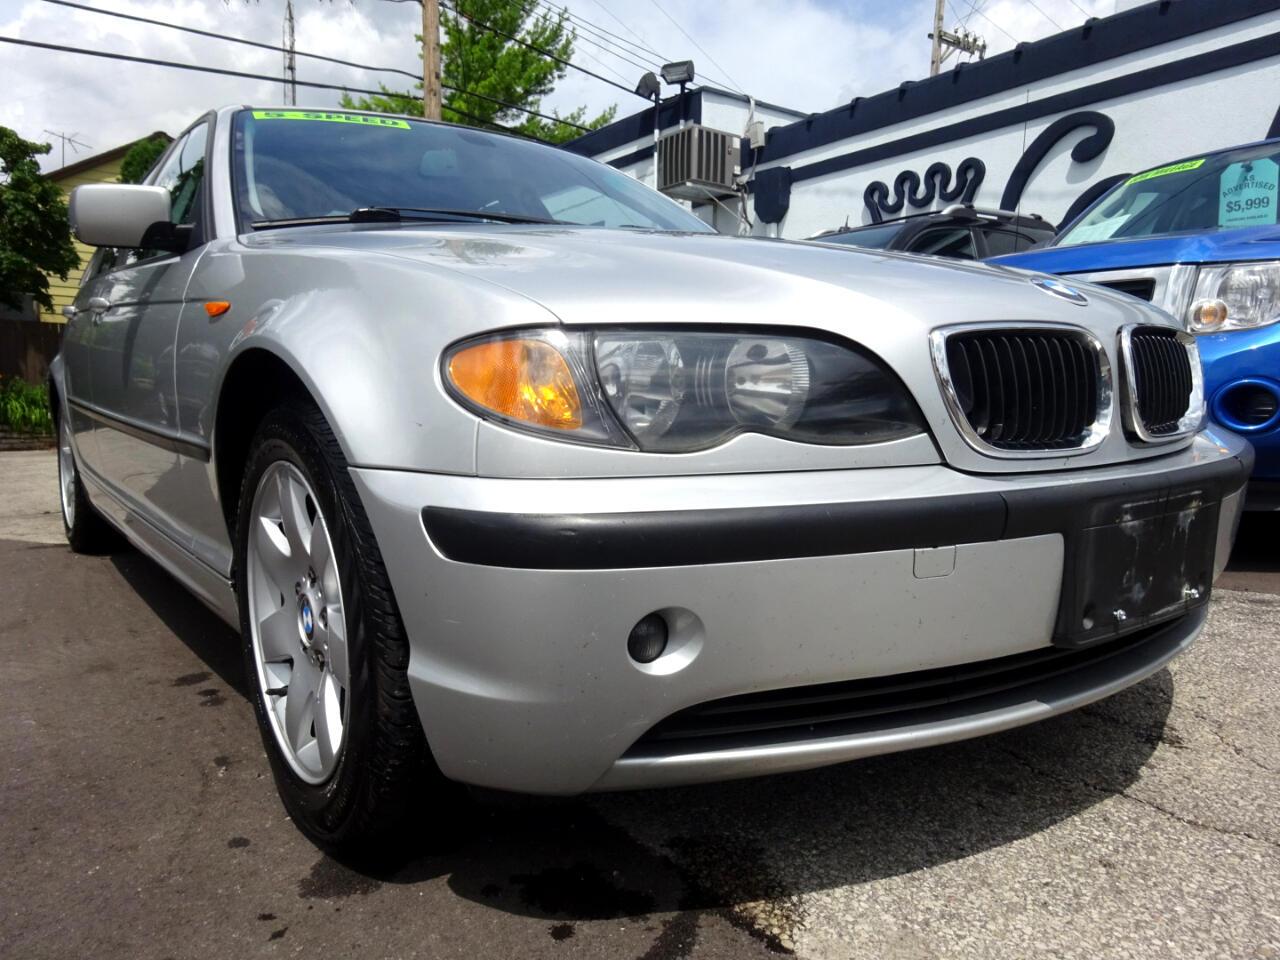 BMW 3 Series 325i 4dr Sdn RWD 2004